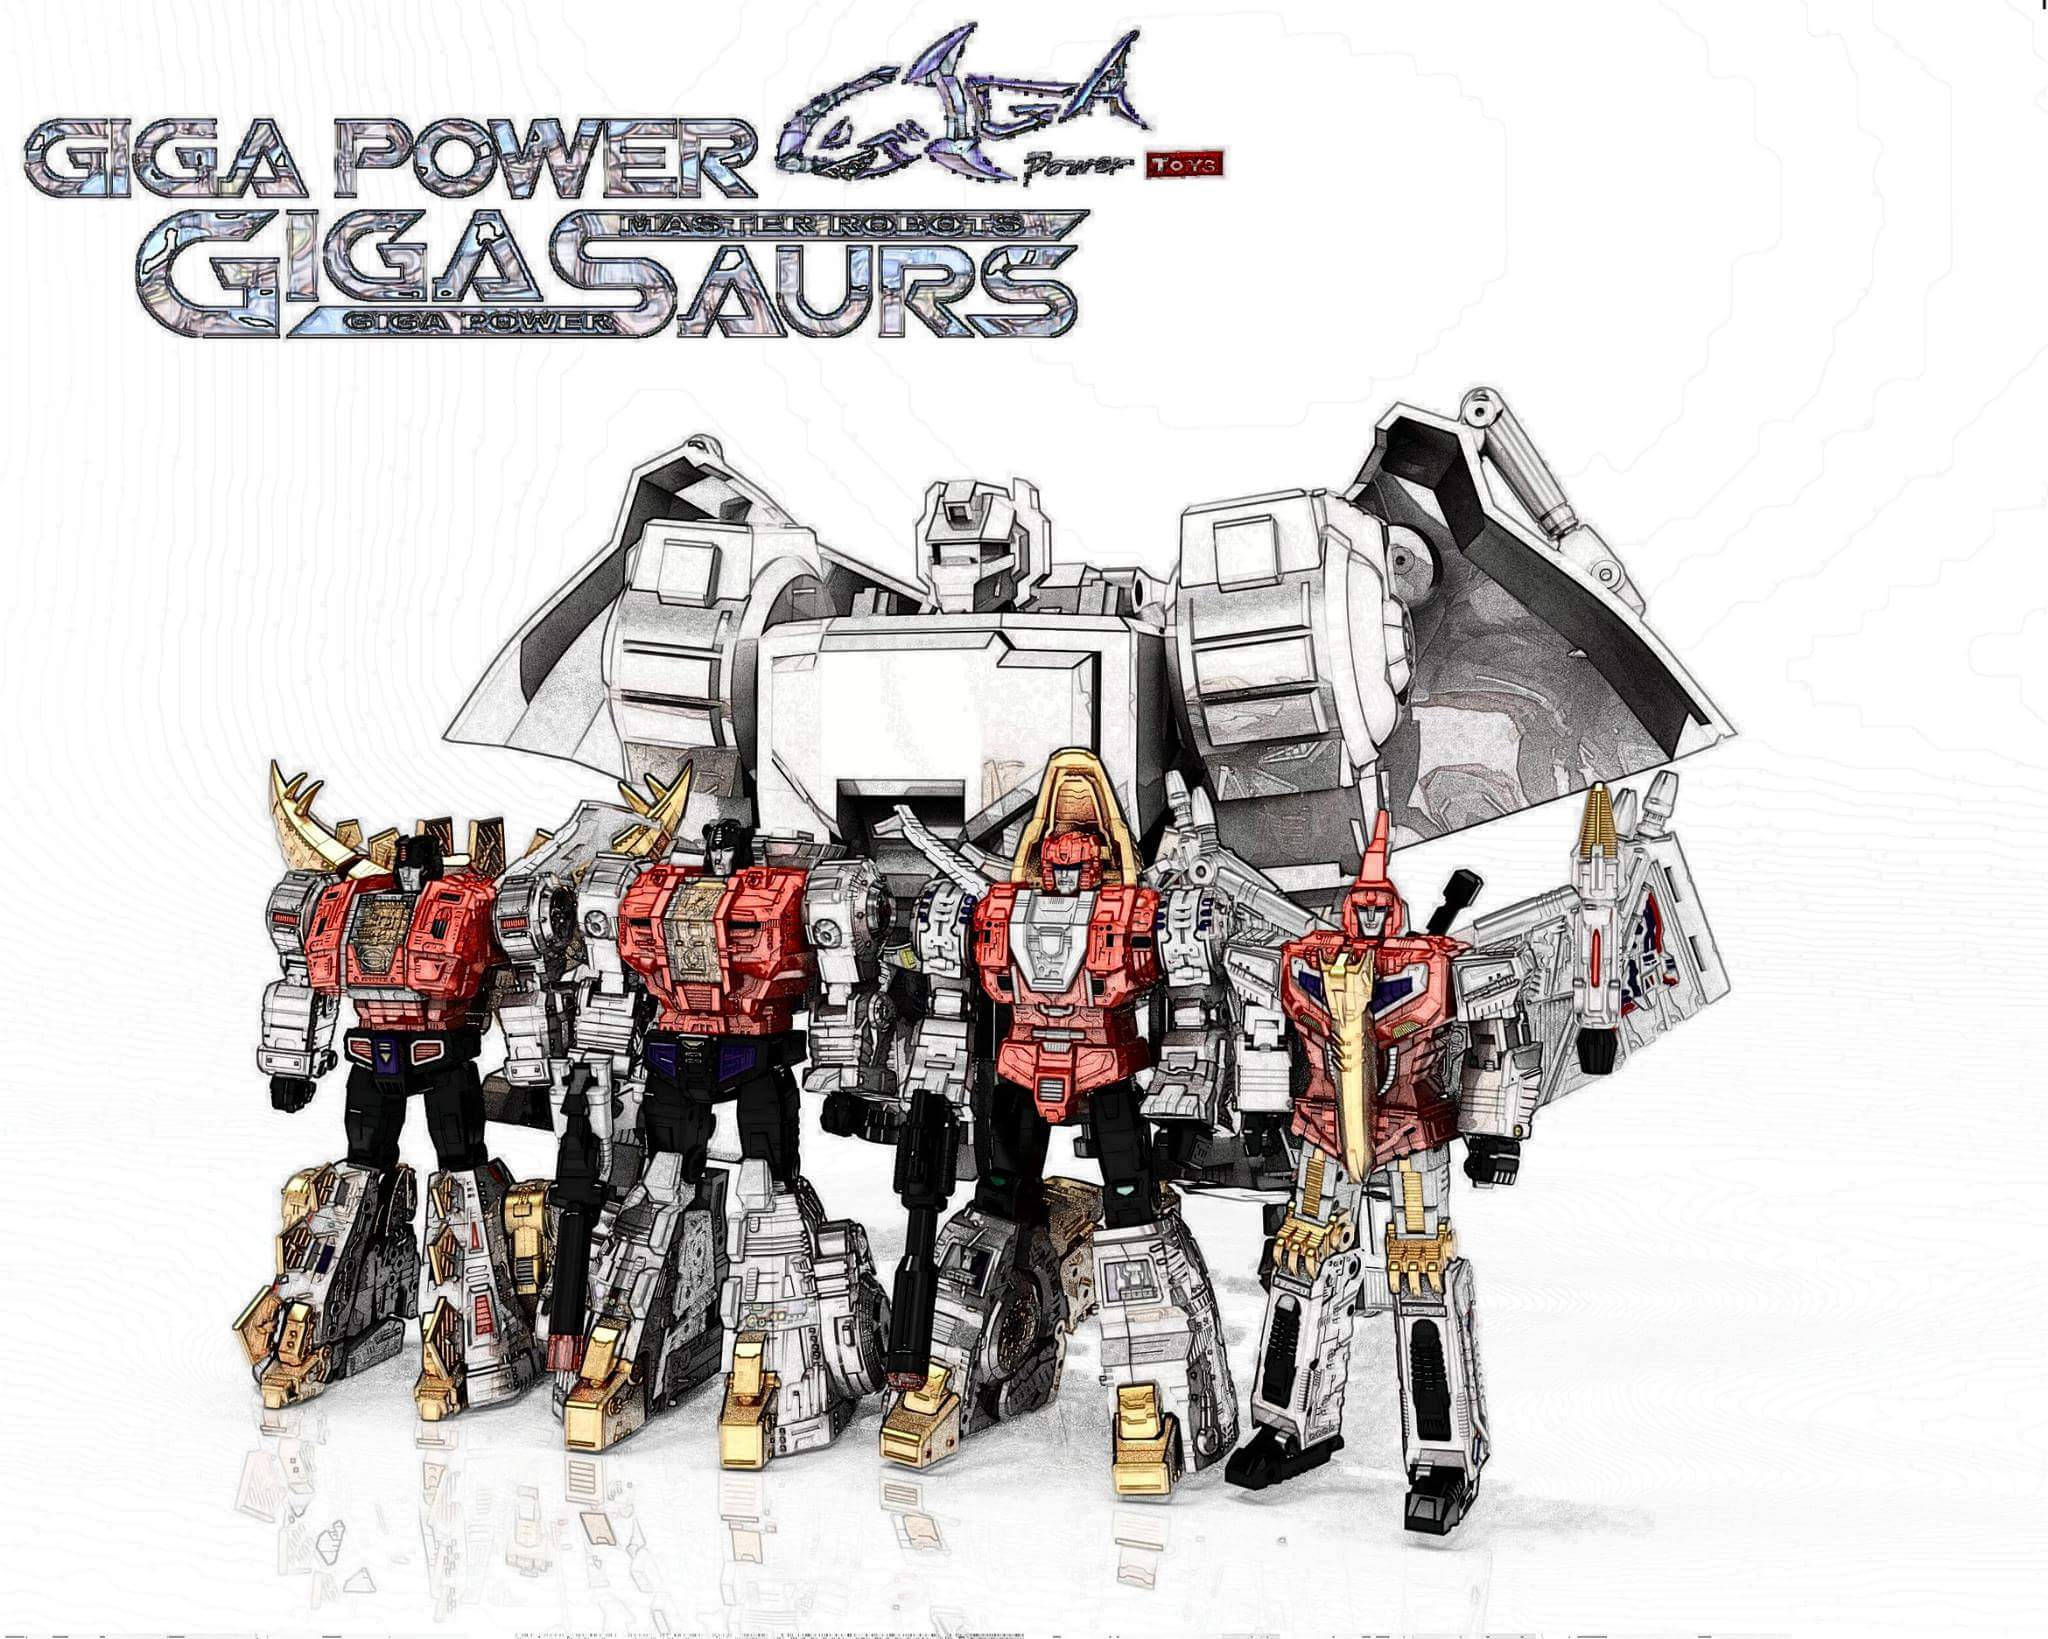 [GigaPower] Produit Tiers - Jouets HQ-01 Superator + HQ-02 Grassor + HQ-03 Guttur + HQ-04 Graviter + HQ-05 Gaudenter - aka Dinobots - Page 5 DD2KMQYh